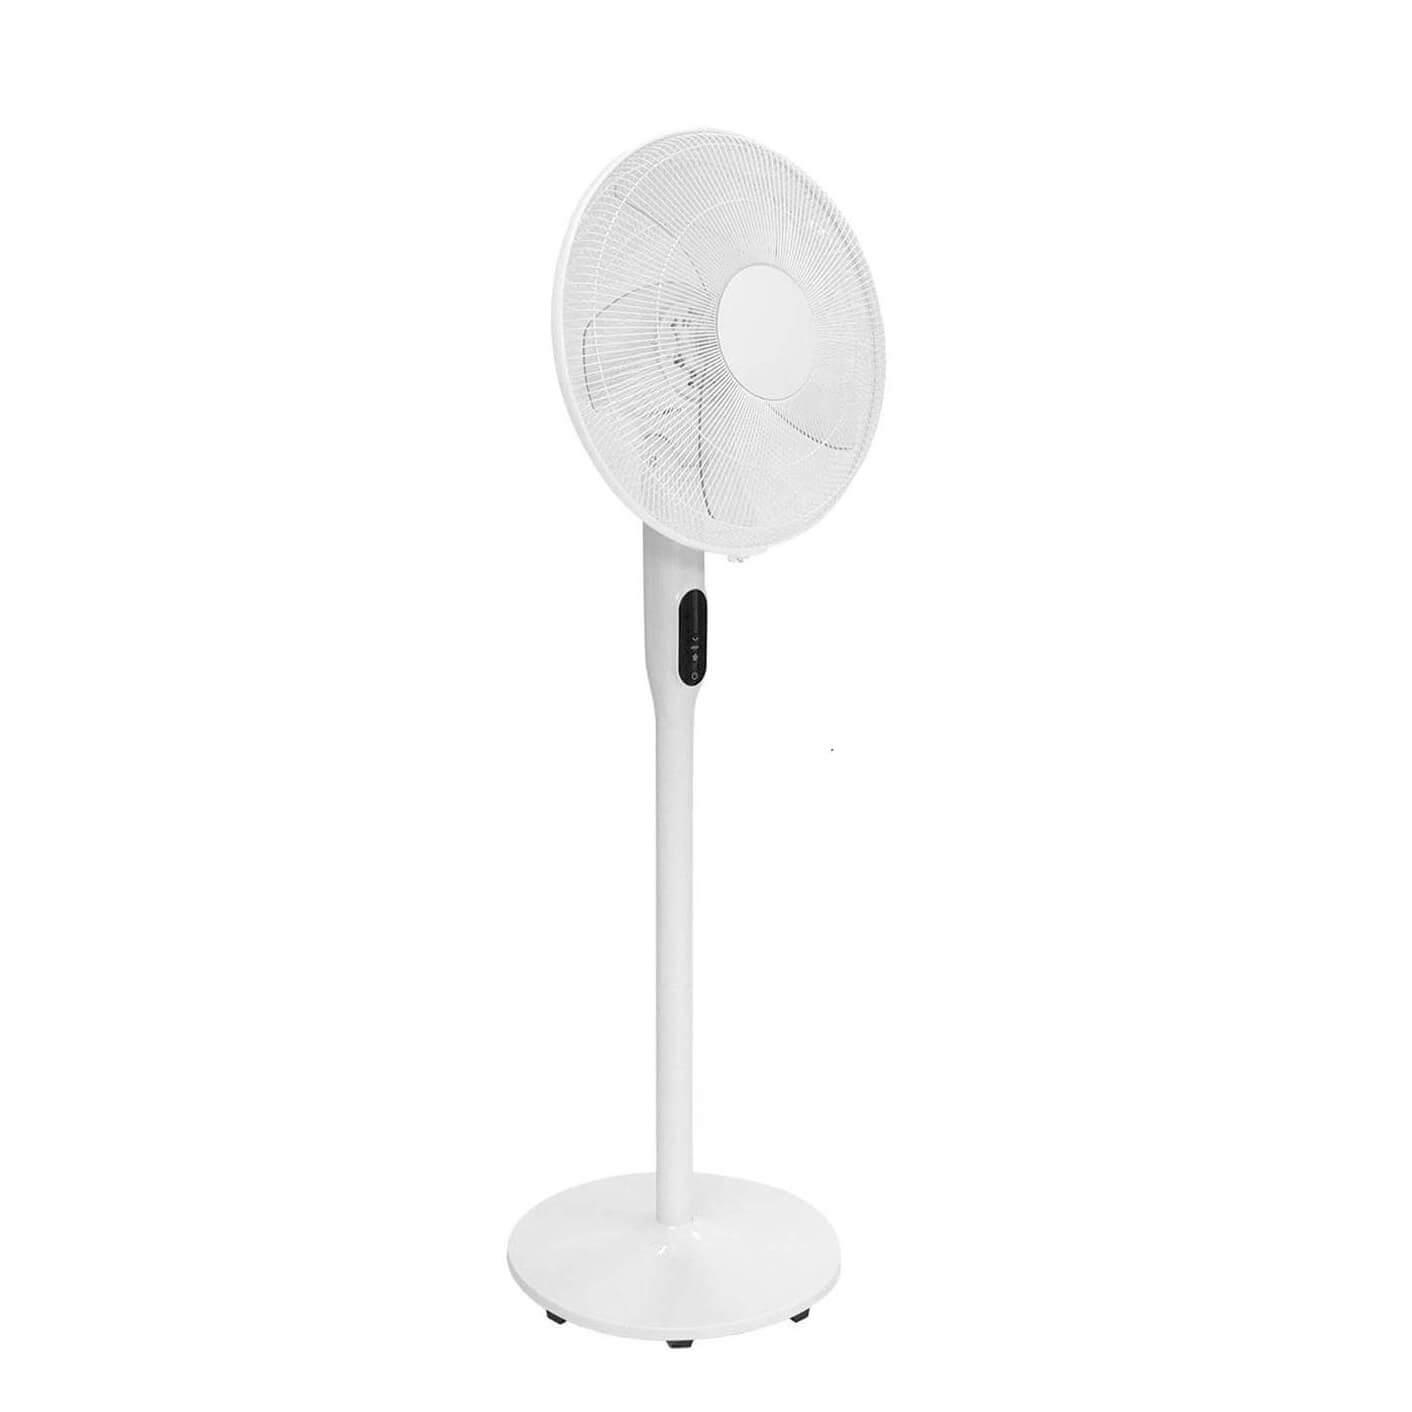 Jack Stonehouse Electric Cooling Pedestal Fan